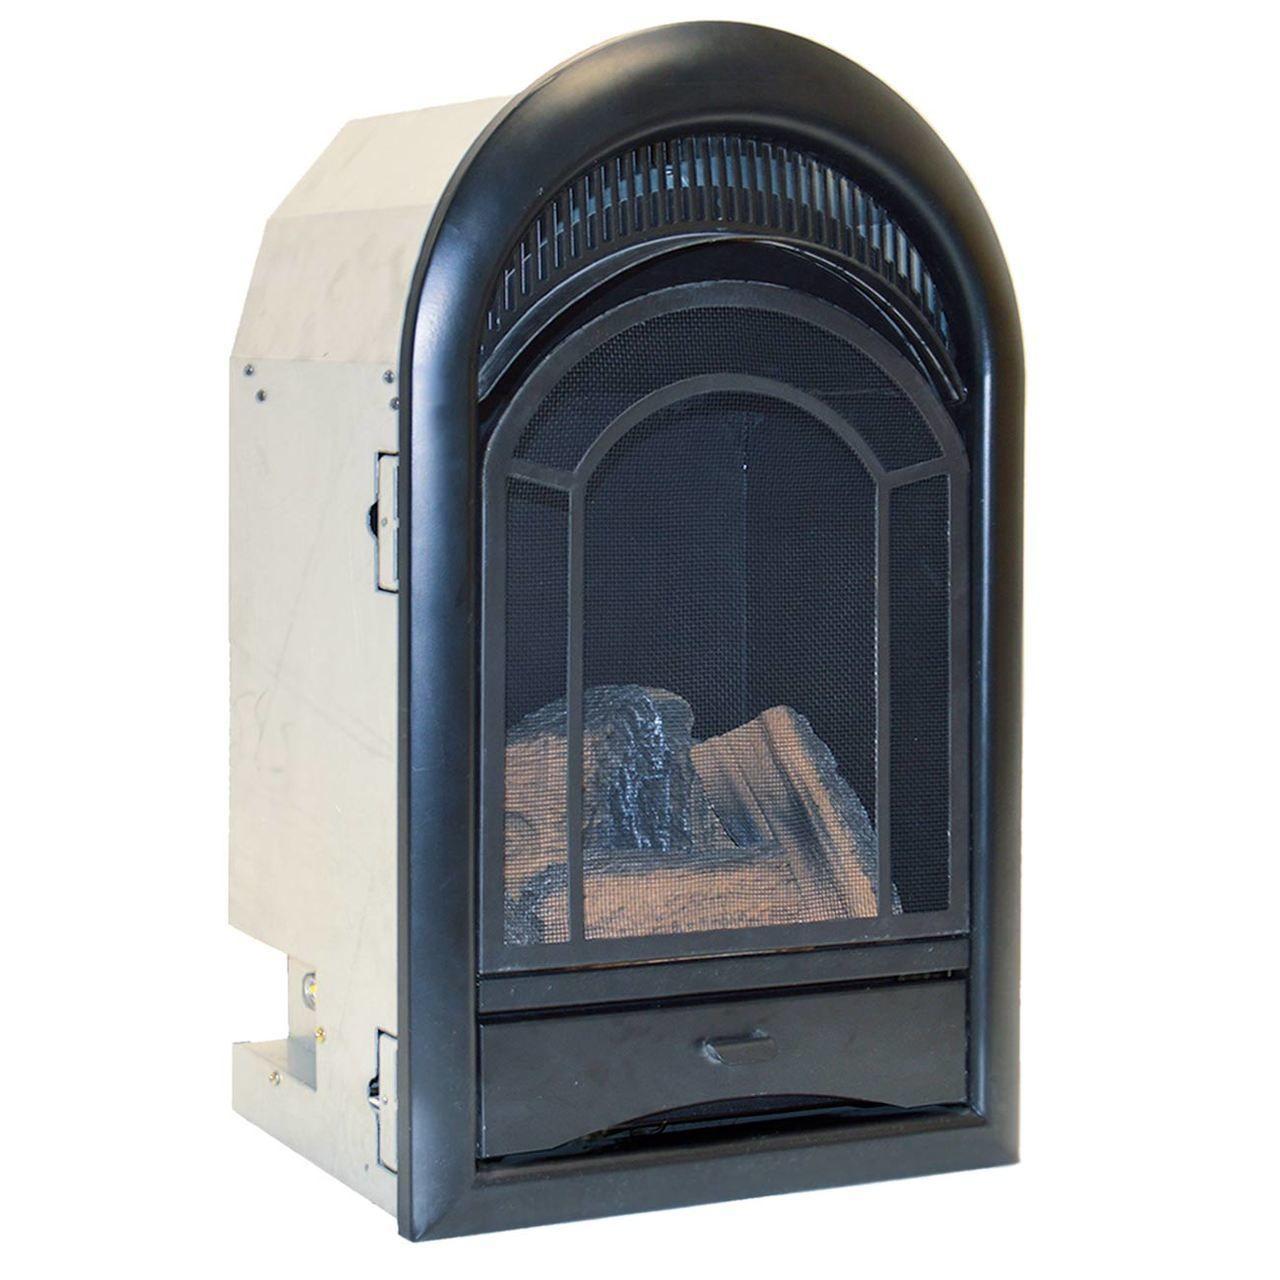 Procom Ventless Fireplace Insert Thermostat Control Arched Door 10 000 Btu Model Pcs100t Ventless Fireplace Ventless Fireplace Insert Fireplace Inserts